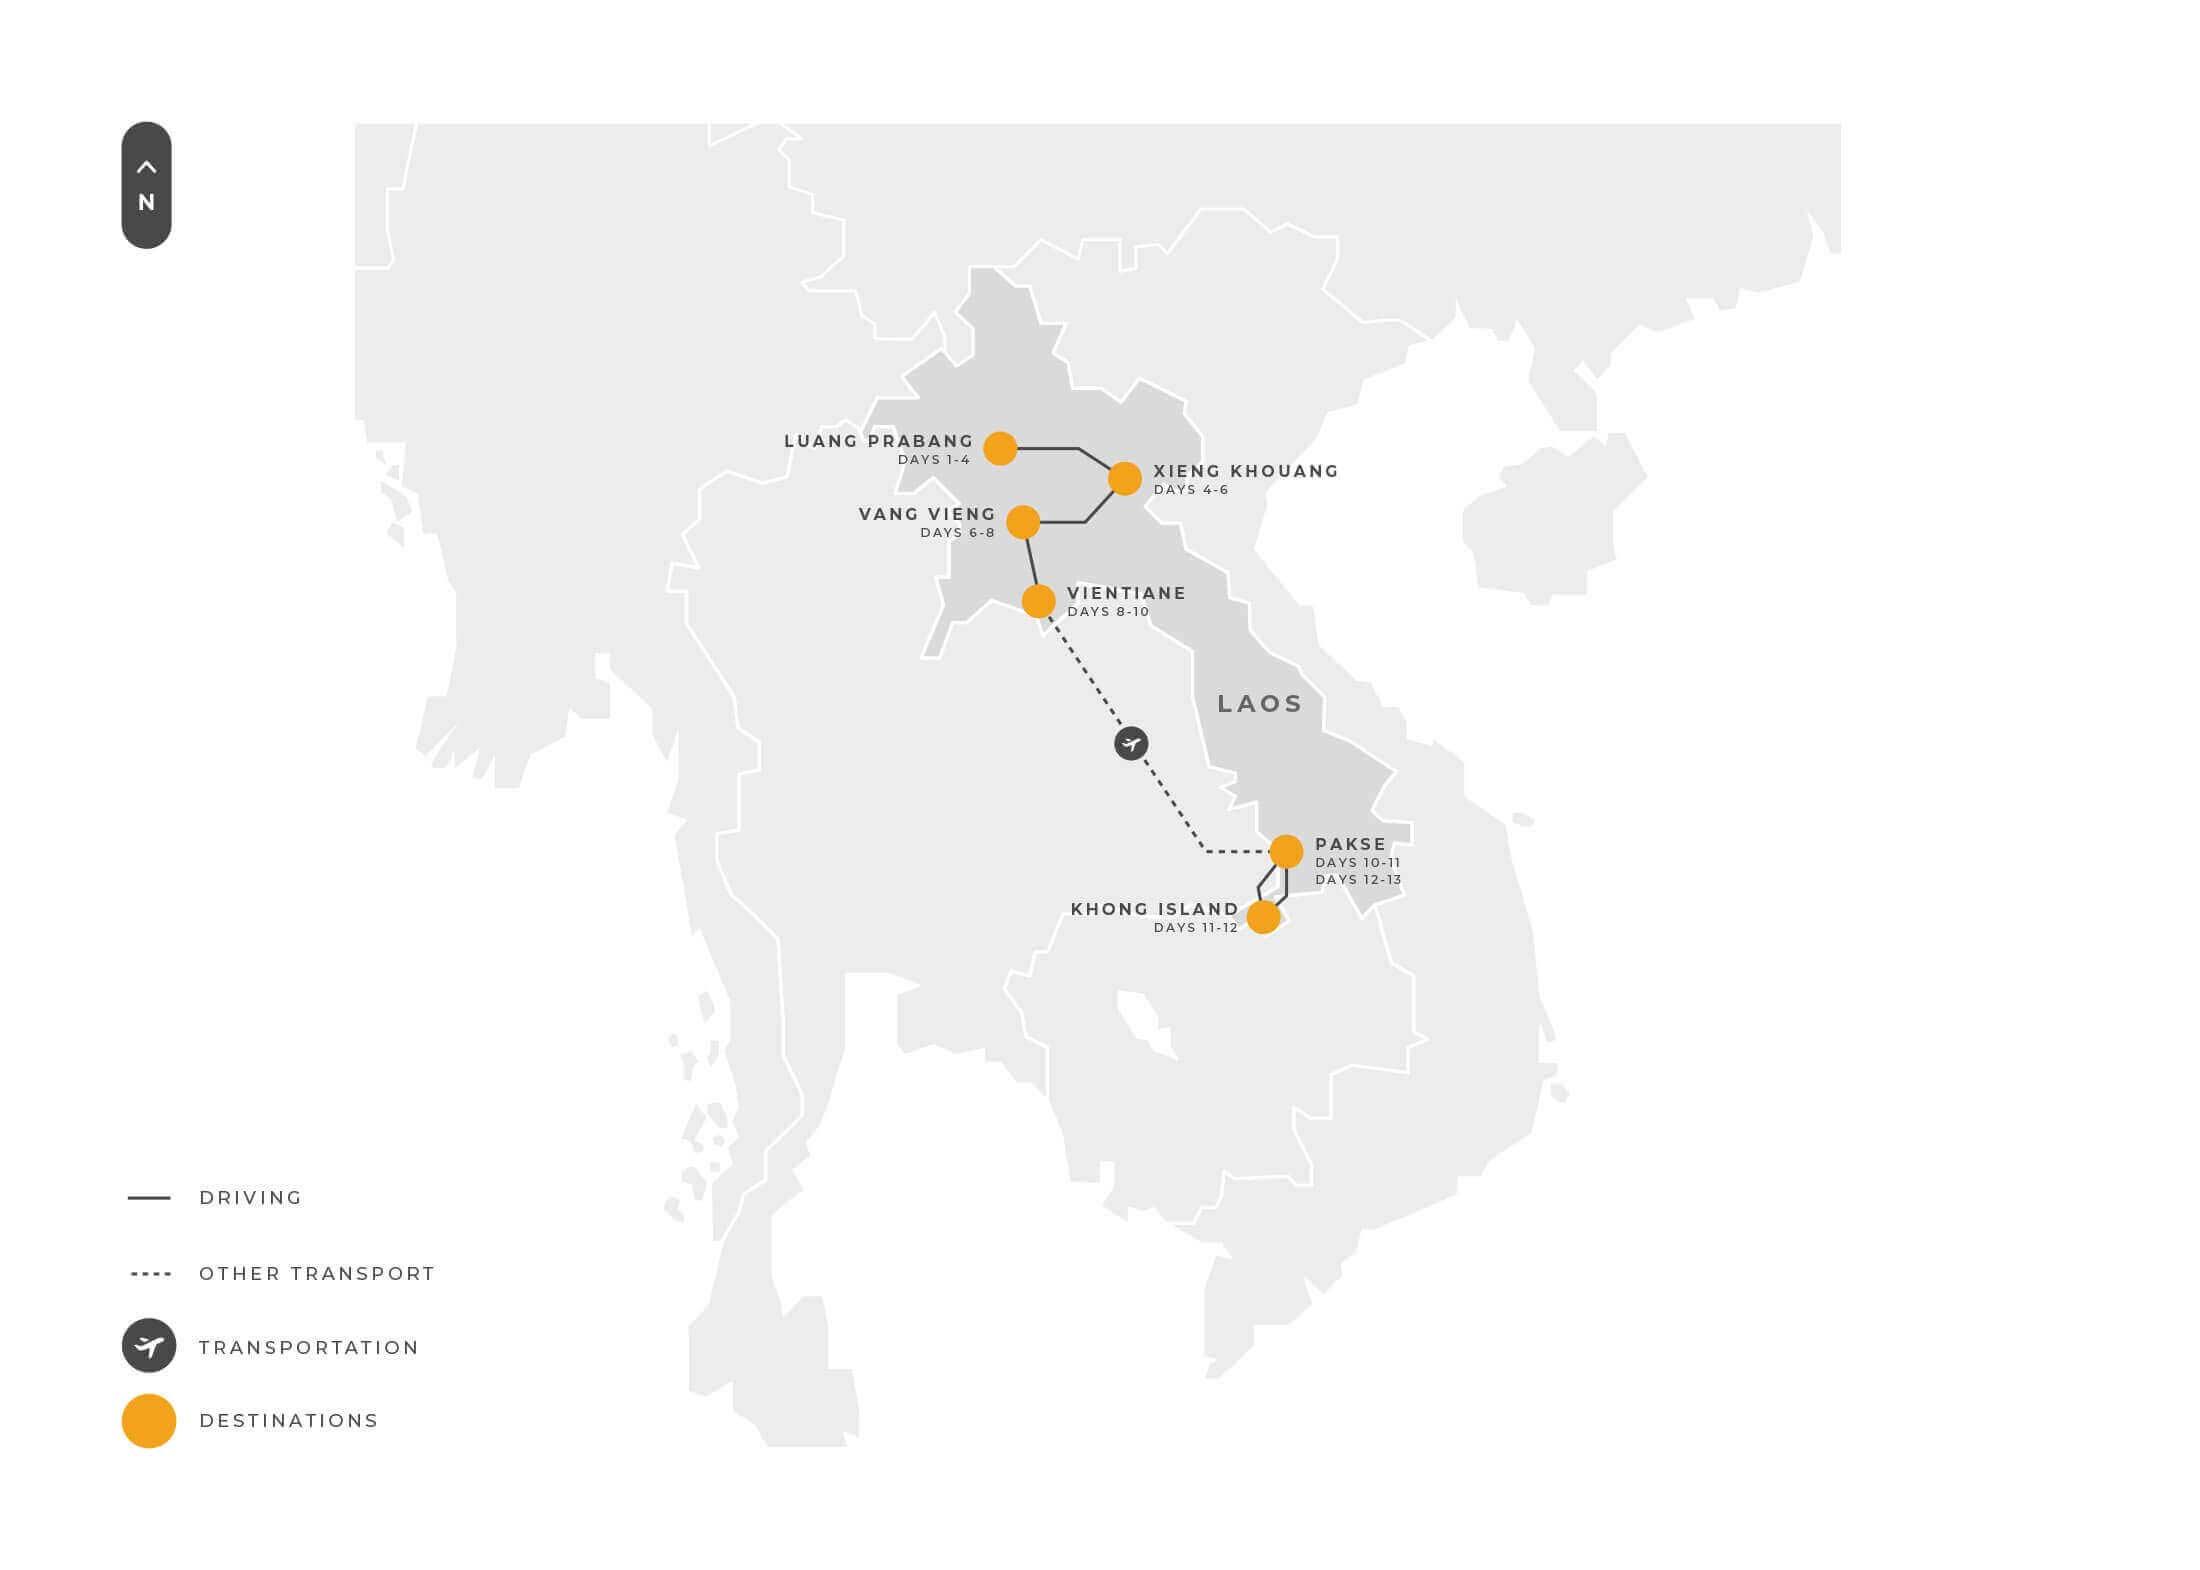 Laos13 Days Luangprabang Xiengkhouang Vangvieng Vientiane Pakse K